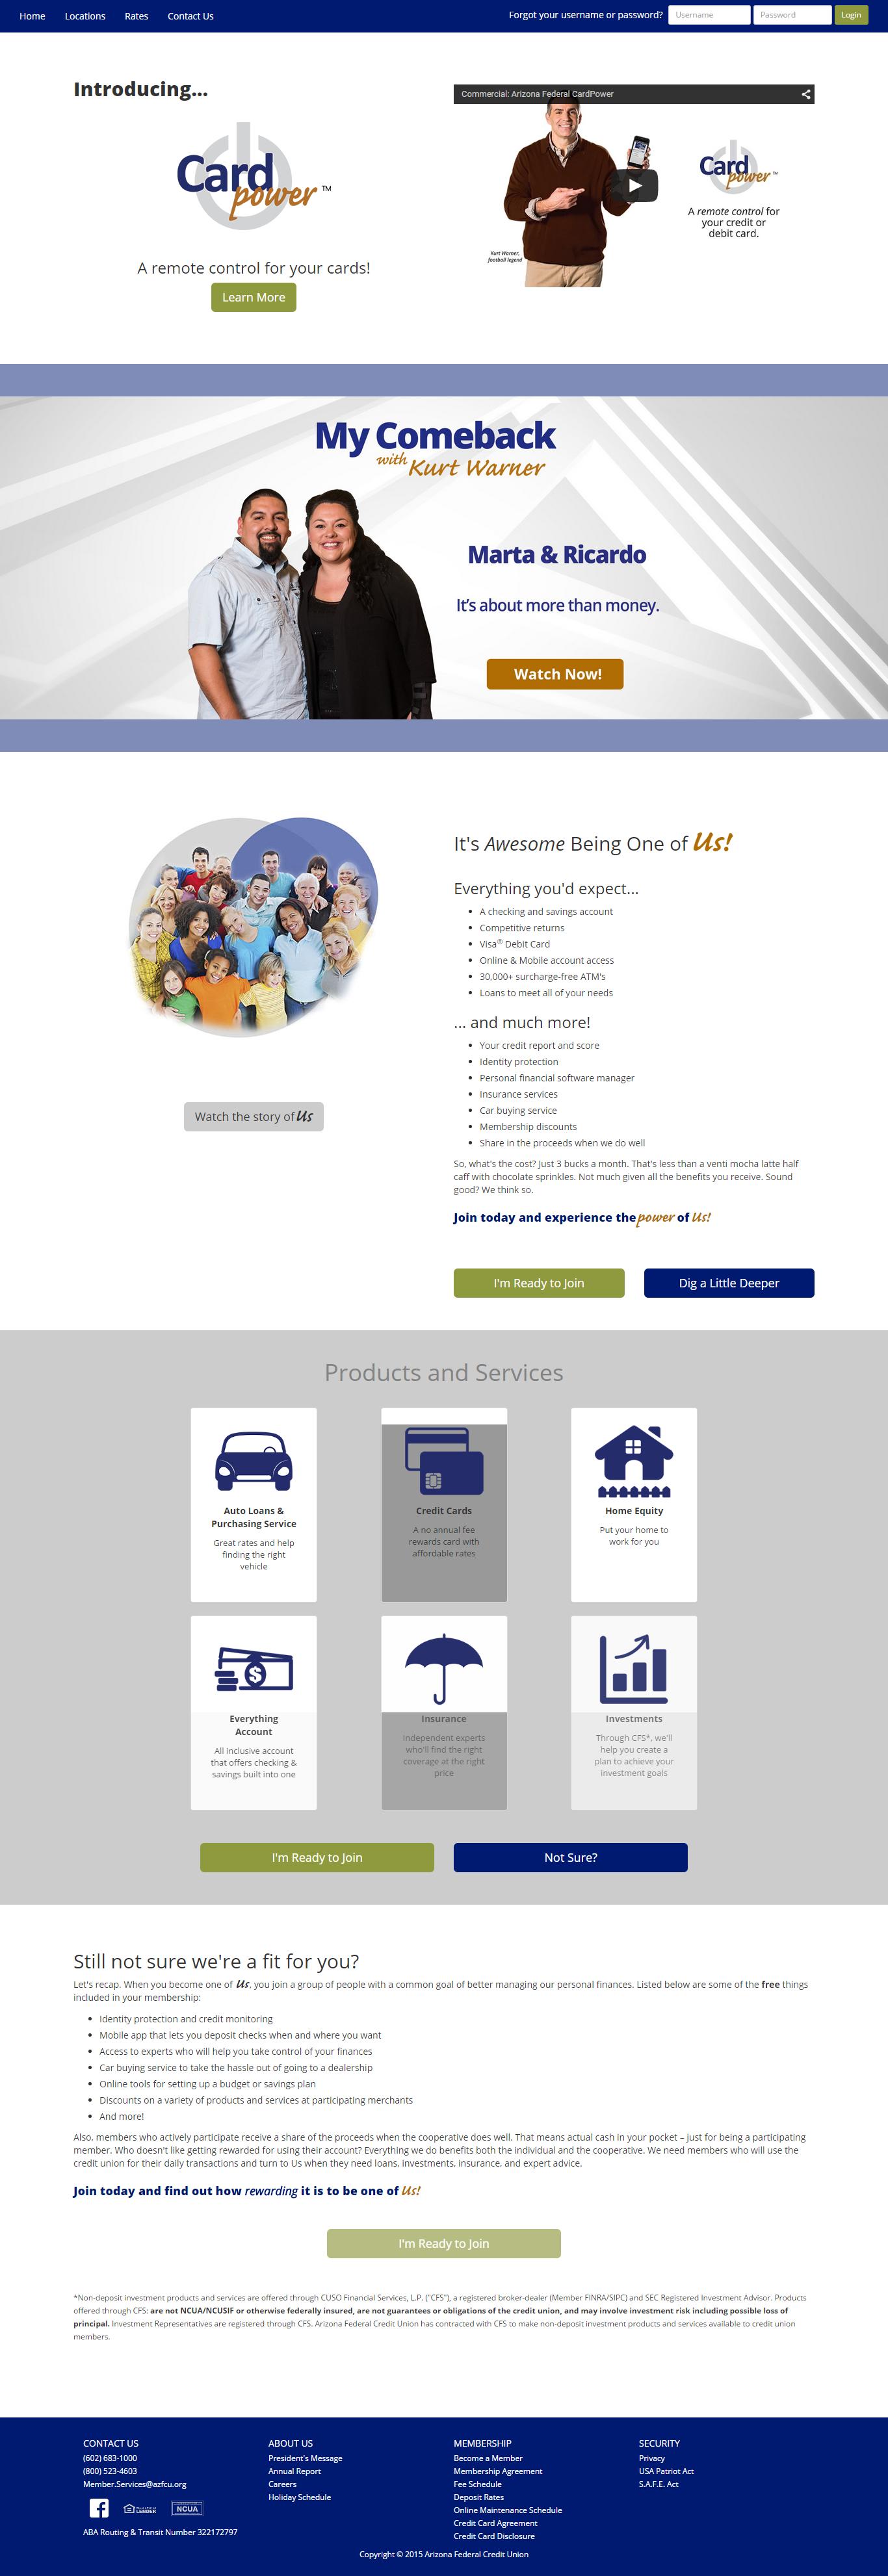 Arizona Federal Credit Union Site